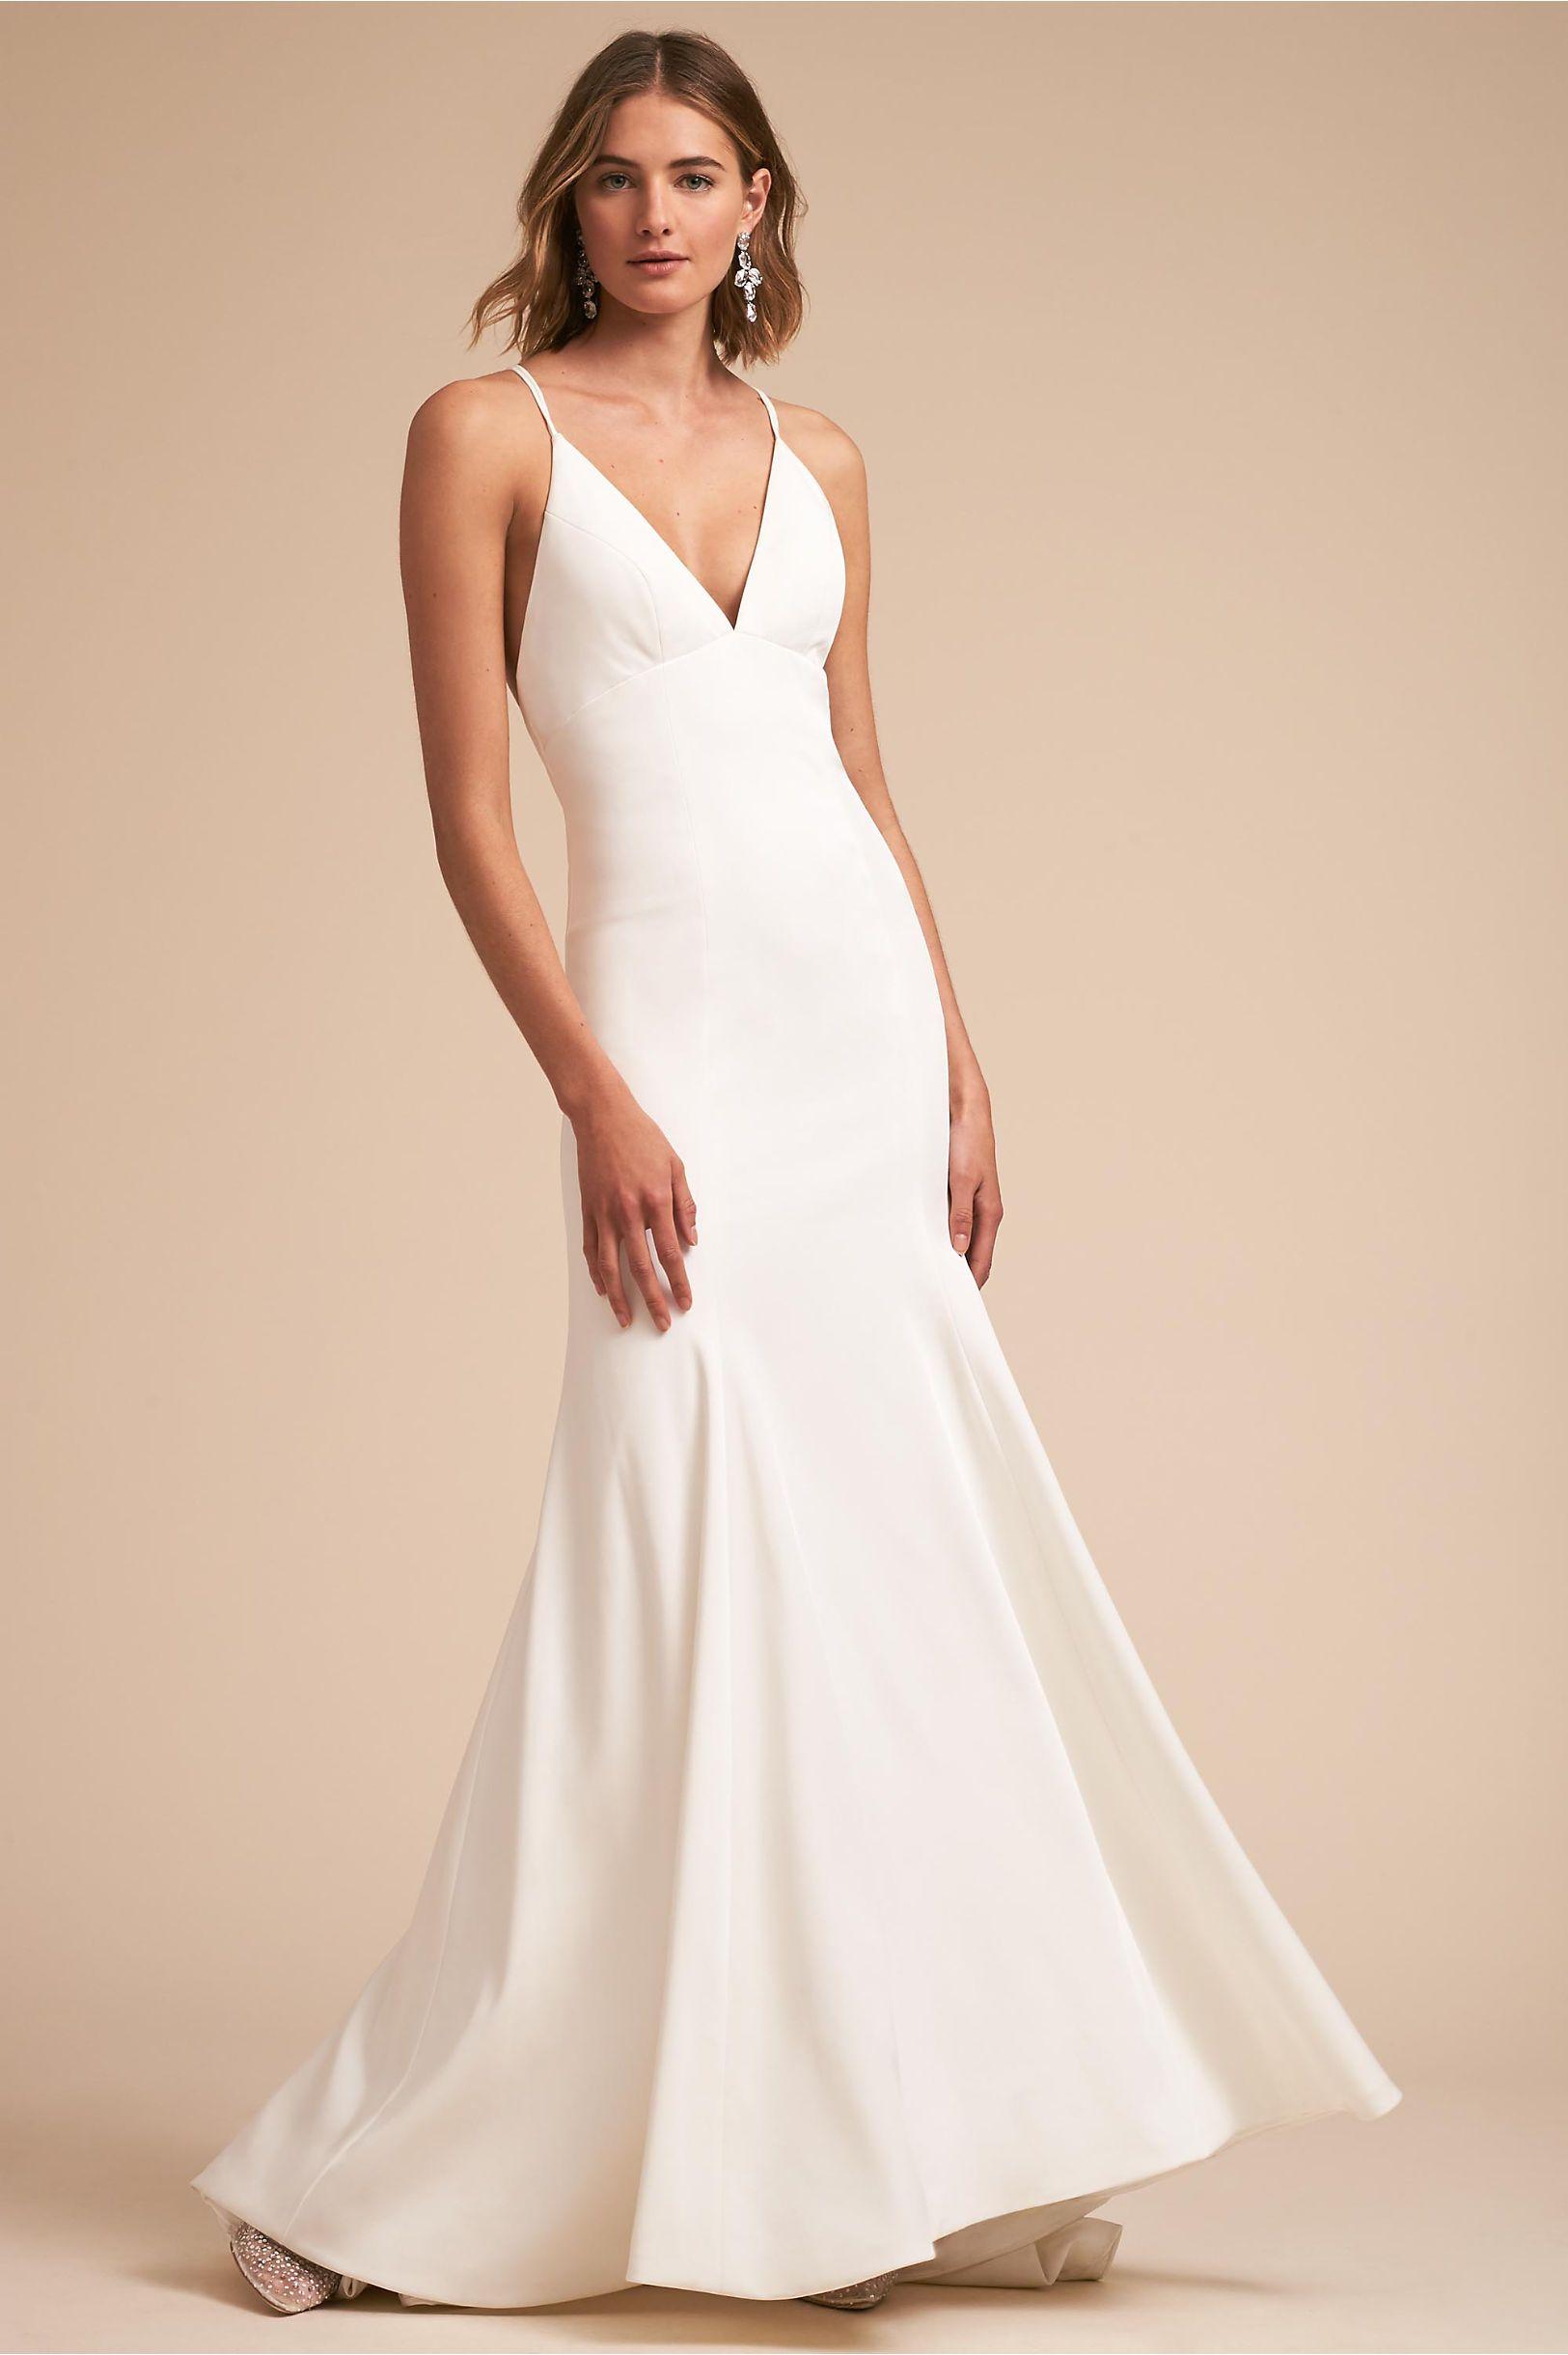 Bhldnus jenny yoo estelle gown in ivory in wedding dresses